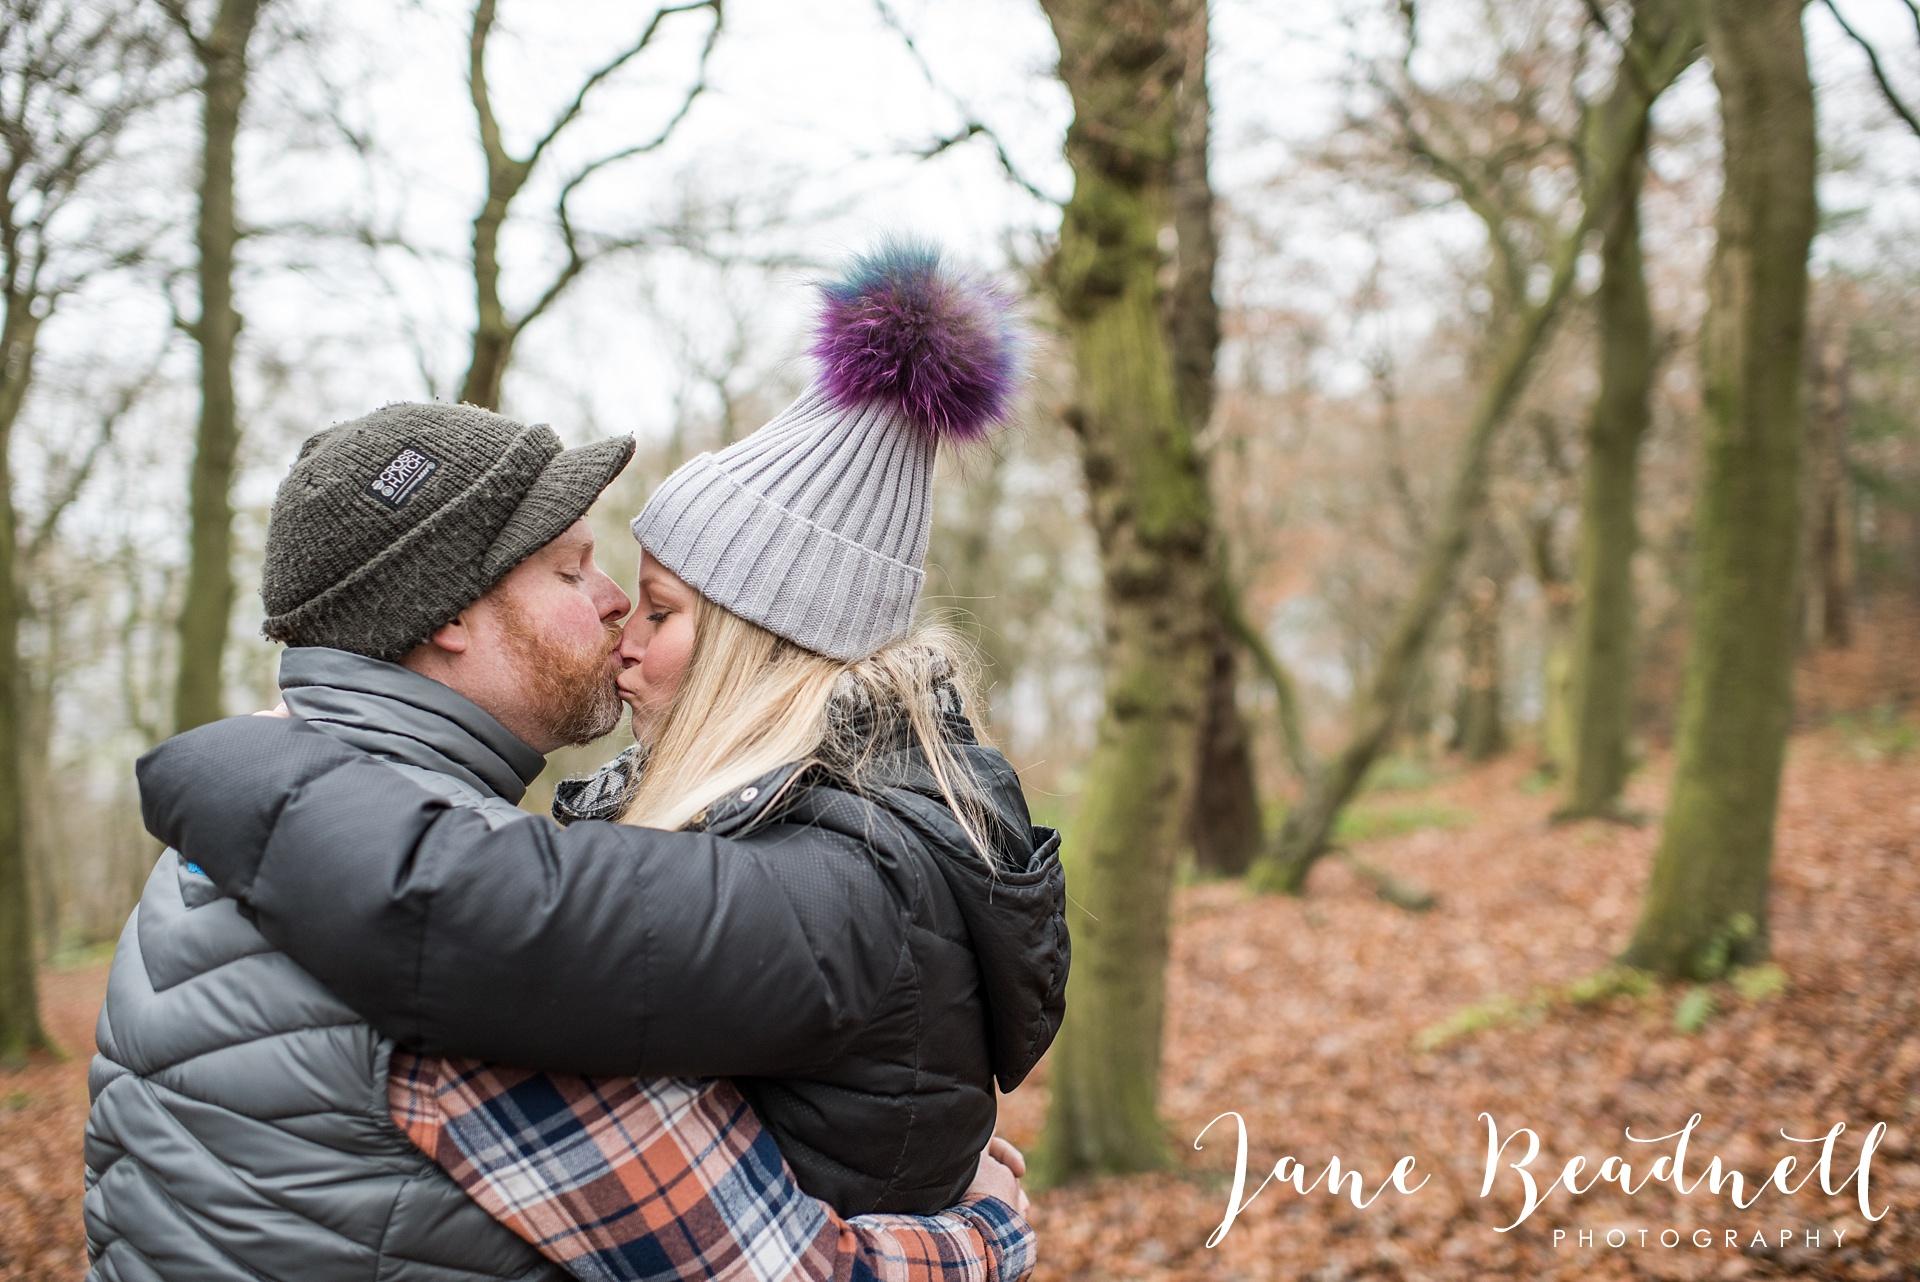 yorkshire-wedding-photographer-jane-beadnell-photography-uk-and-destination-wedding-photographer-engagement-shoot_0049